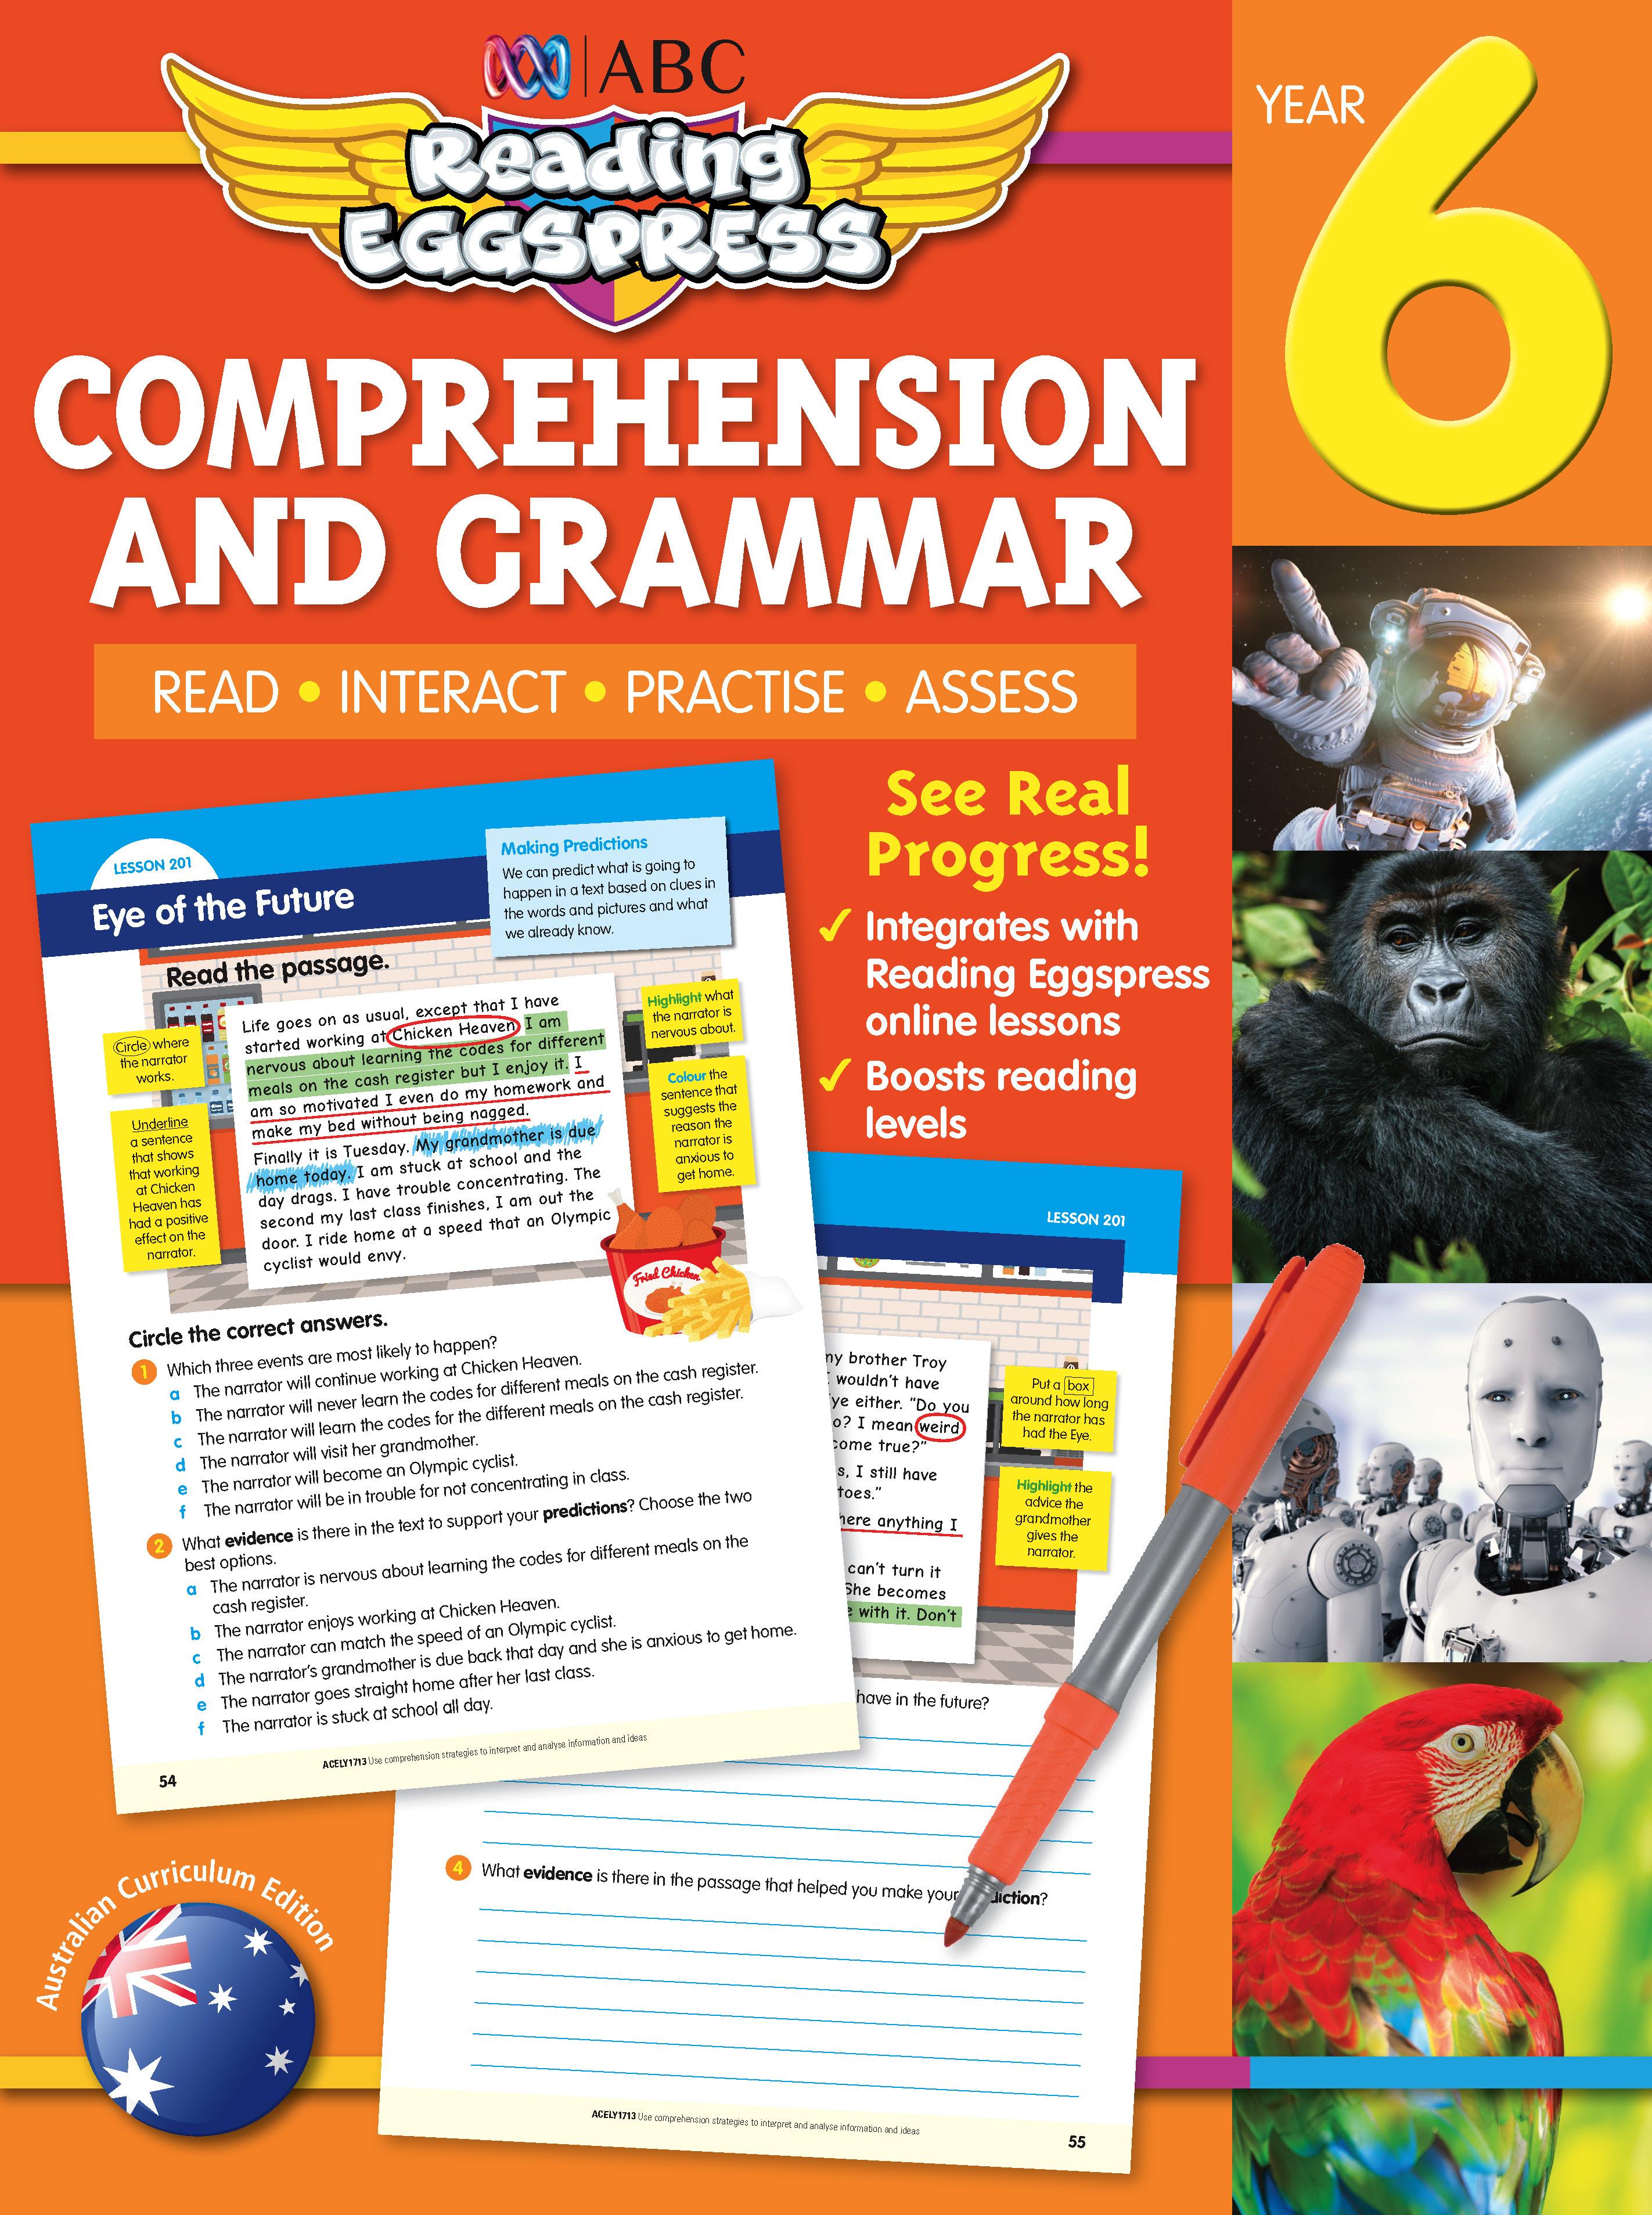 ABC Reading Eggspress Comprehension and Grammar Workbook Year 6